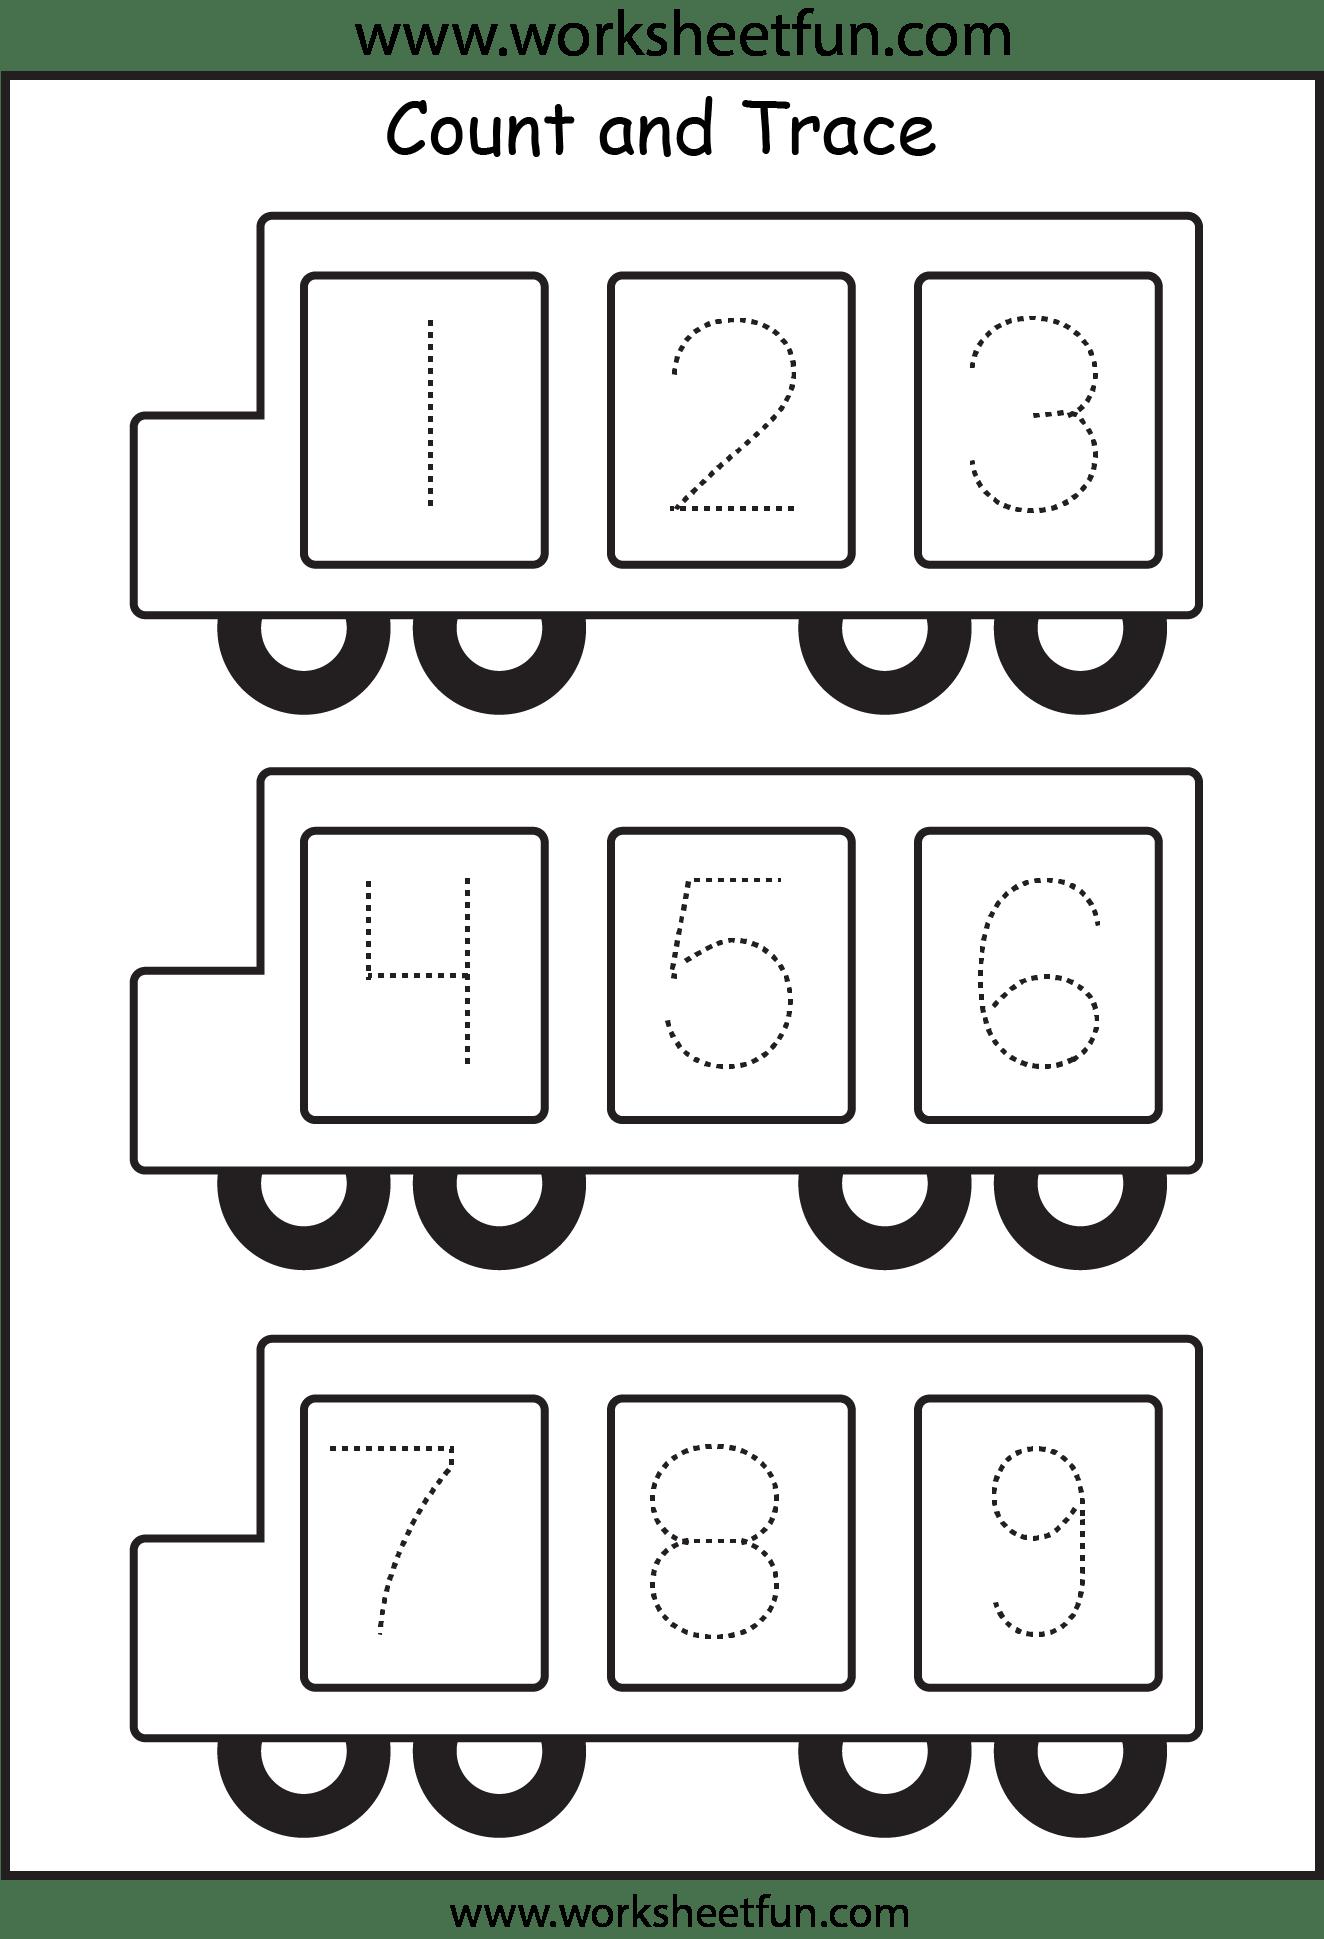 Busnumbertrace1 10 1 324 1 939 Pixels